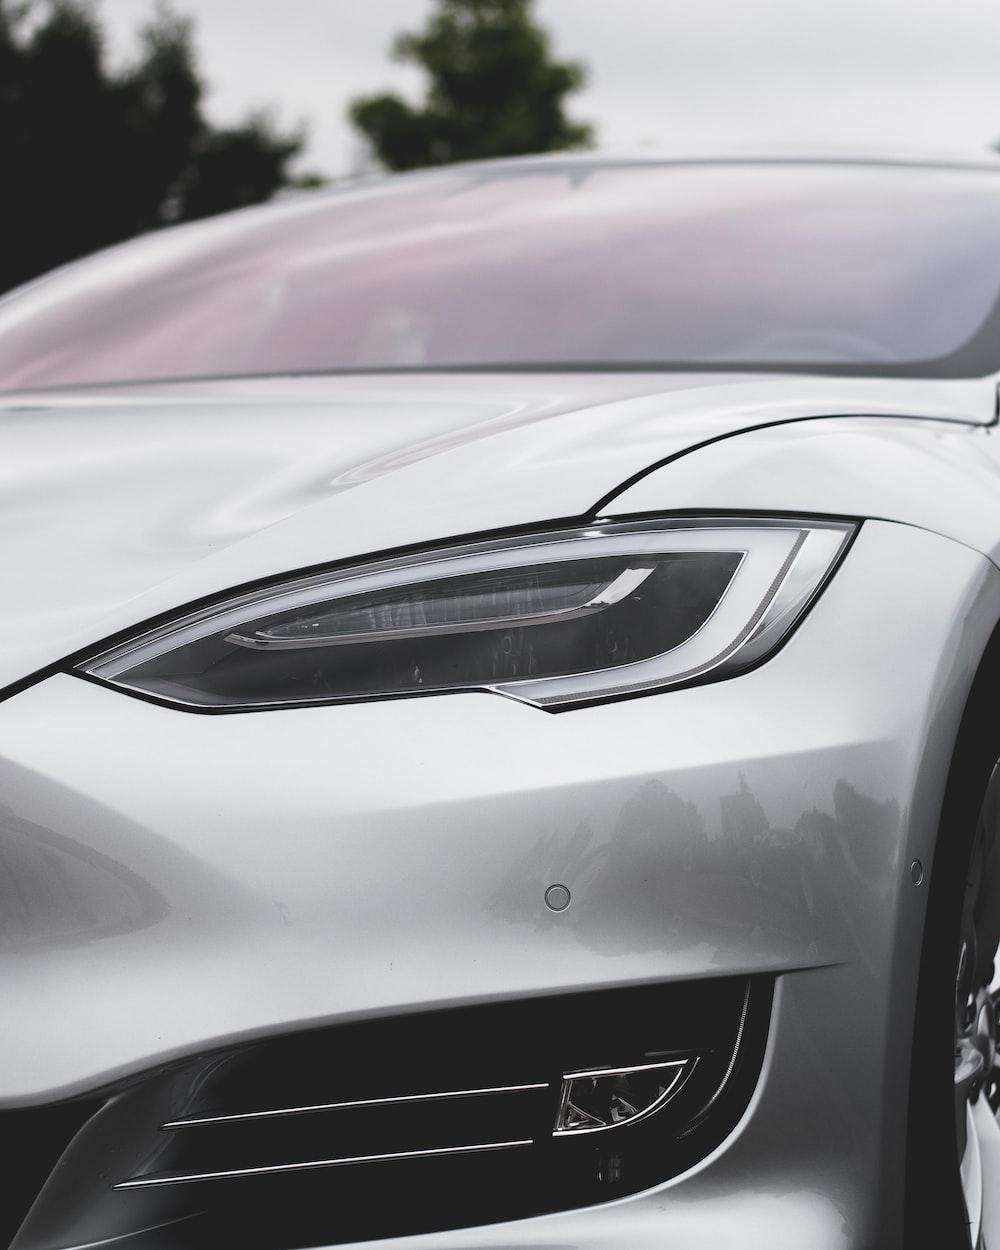 silver vehicle headlight